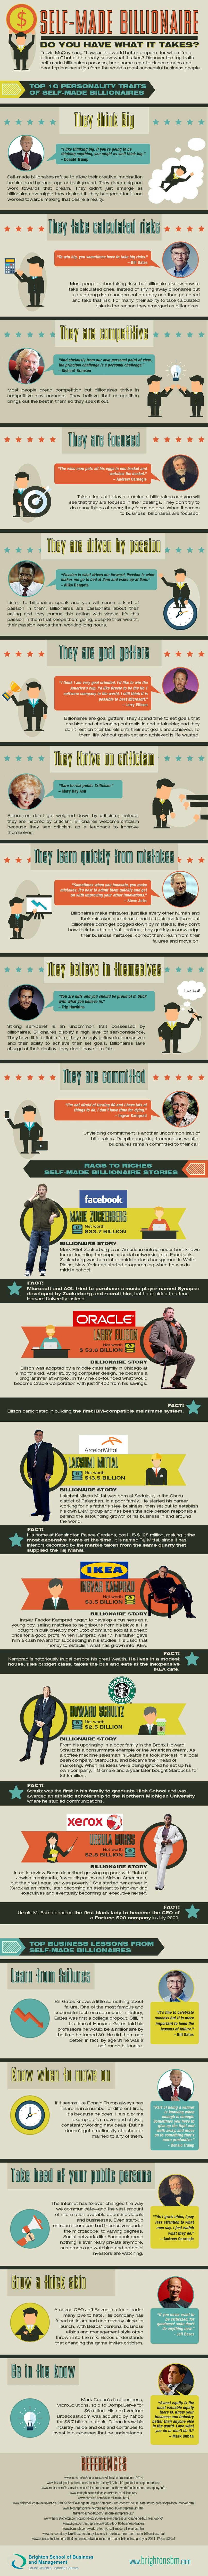 Self-made-Billionaire-Infographic